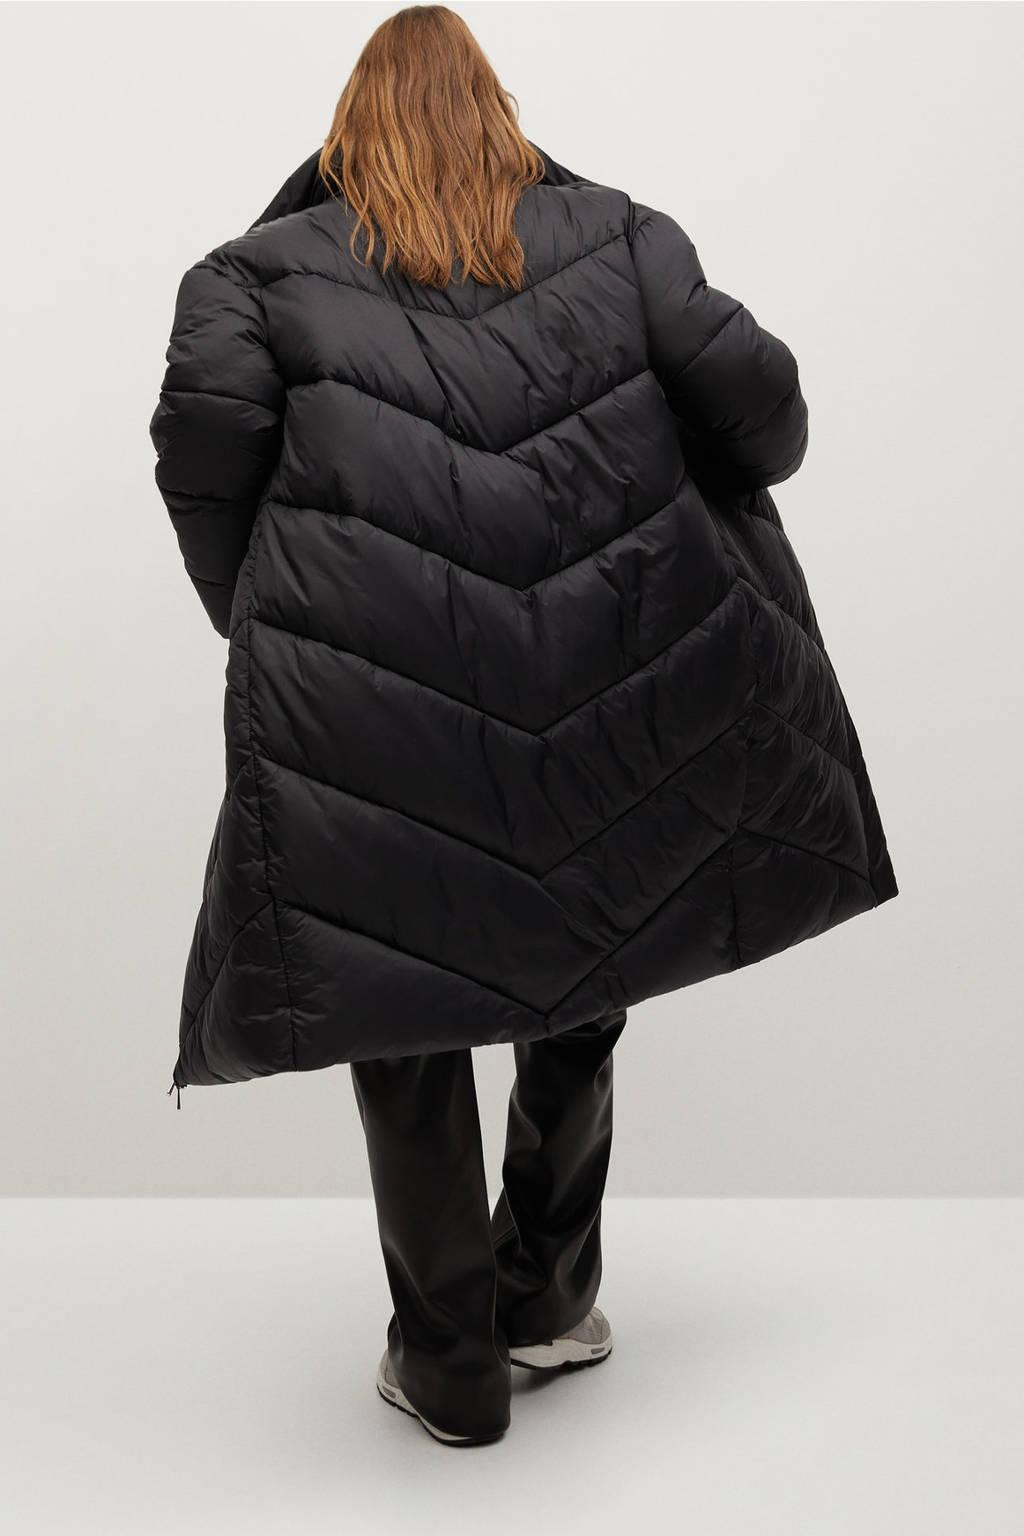 Mango gewatteerde jas zwart, Zwart